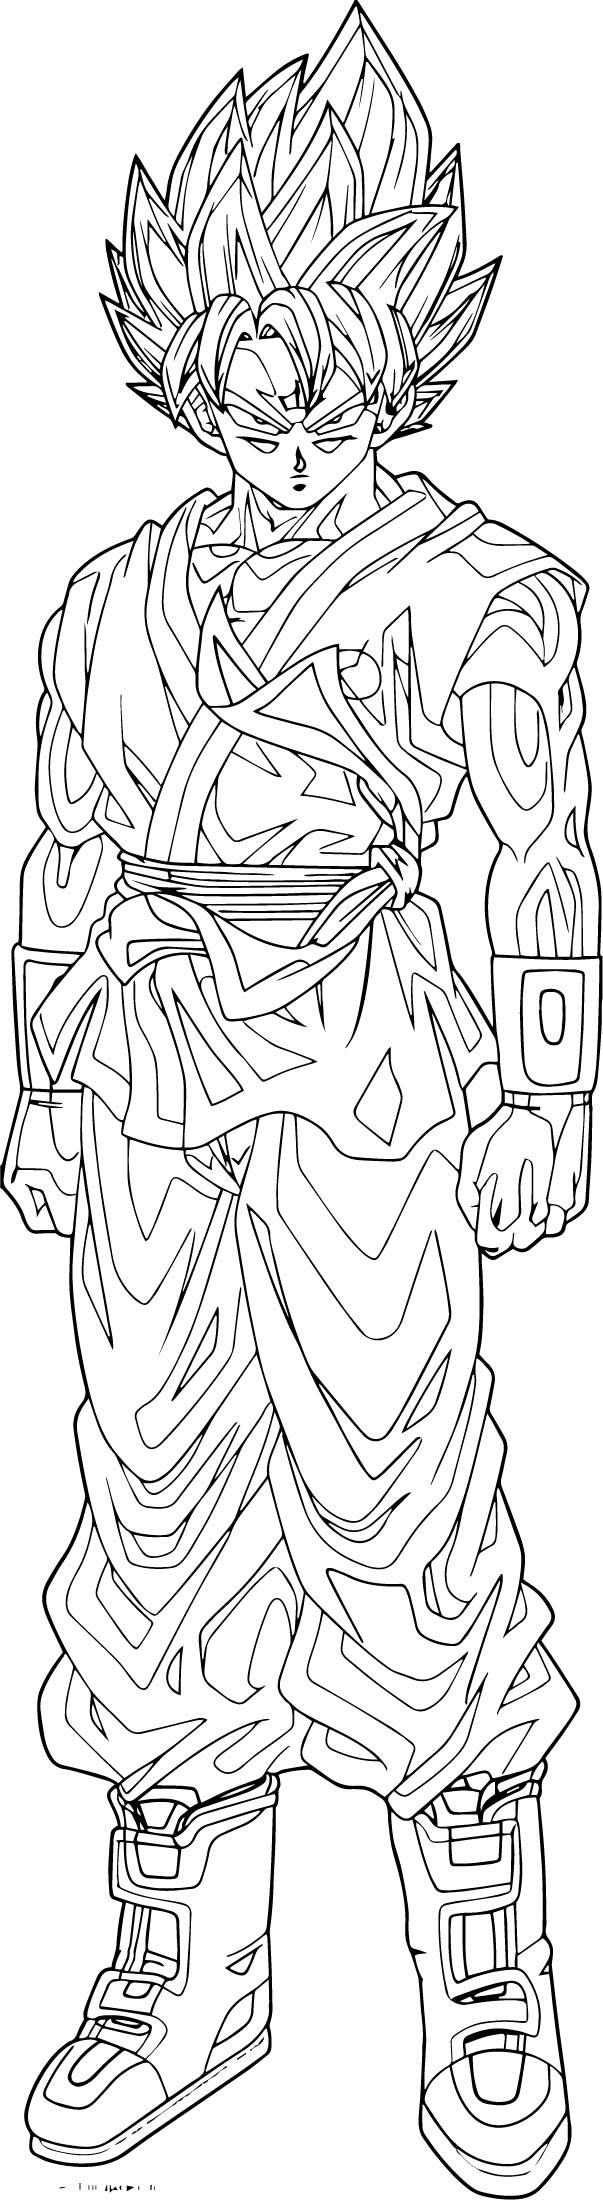 Goku We Coloring Page 440